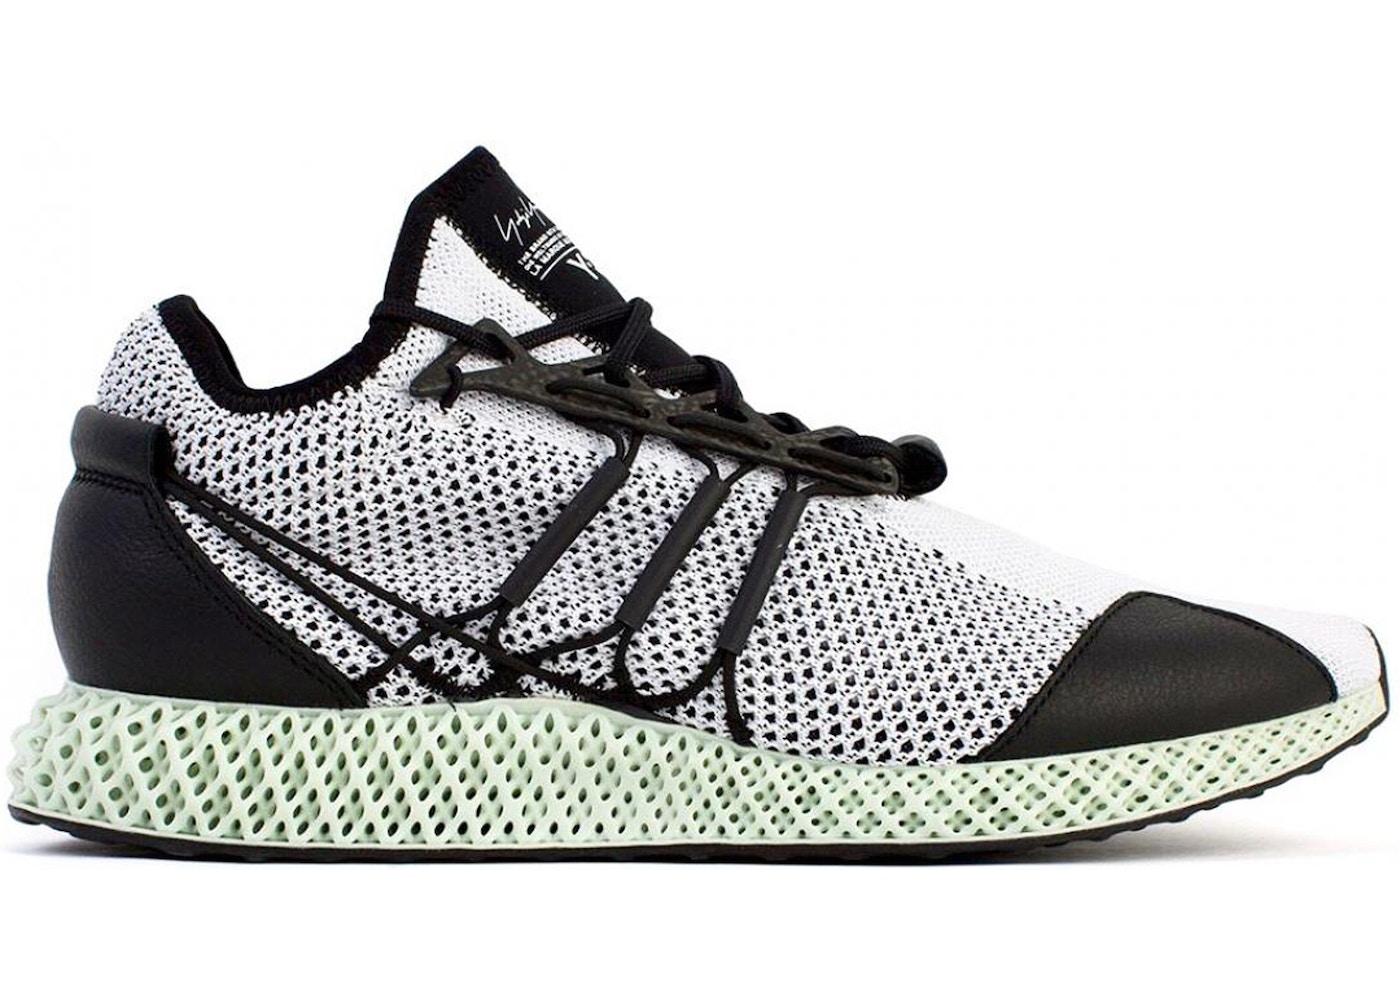 adidas Y-3 Runner 4D Black White